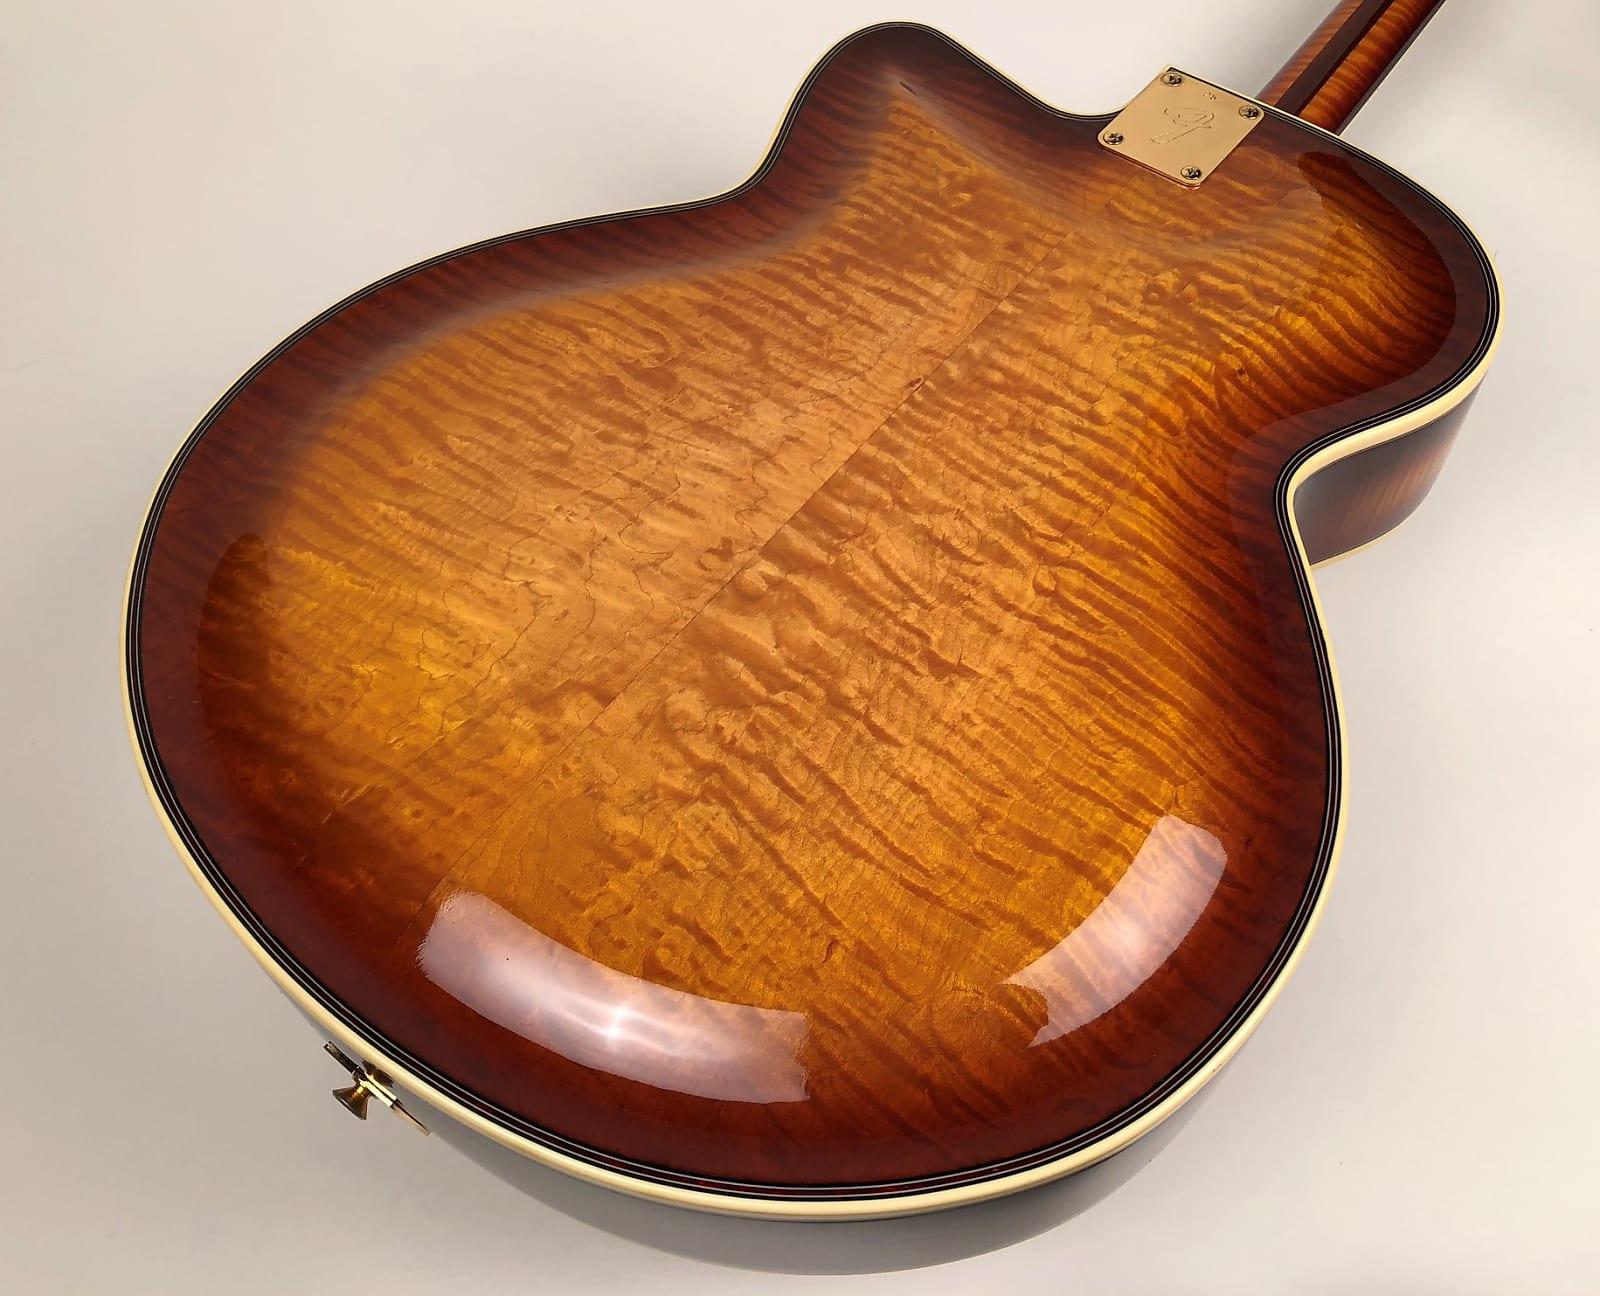 1971 Fender LTD in Sunburst #25 of 36 Made & Signed by both Roger Rossmeisl & Phil Kubicki with HSC